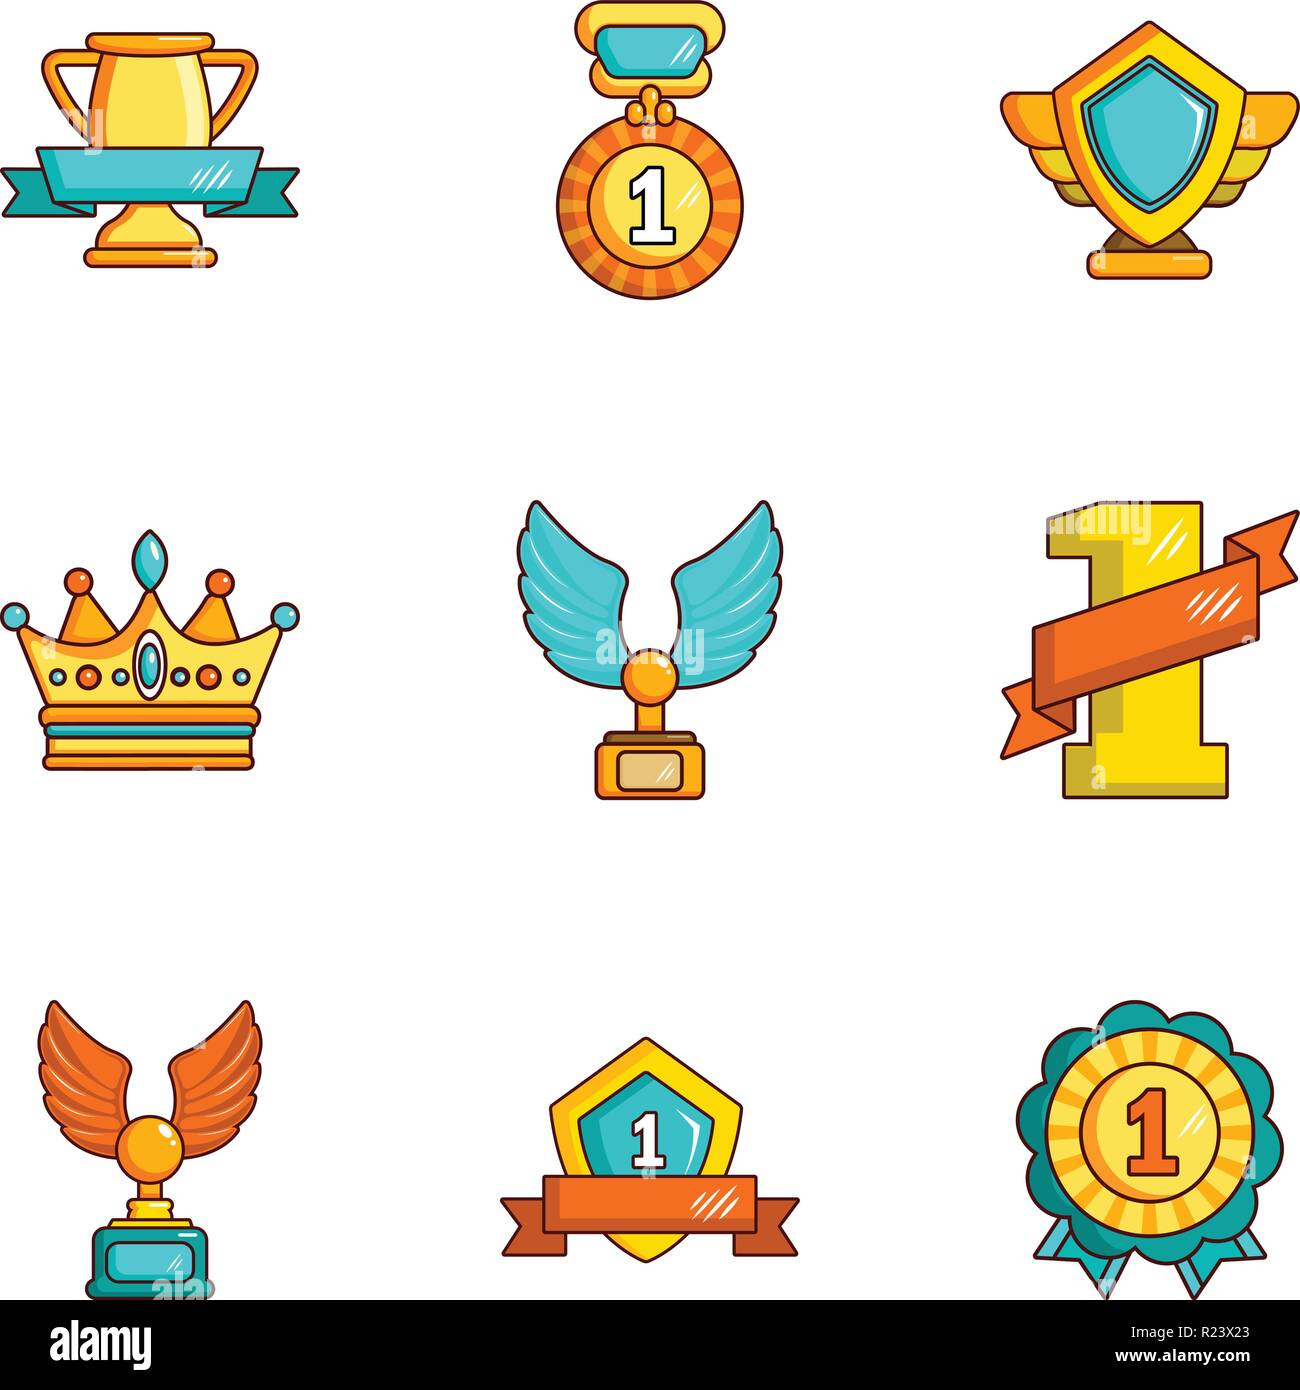 Dearness icons set, cartoon style - Stock Image